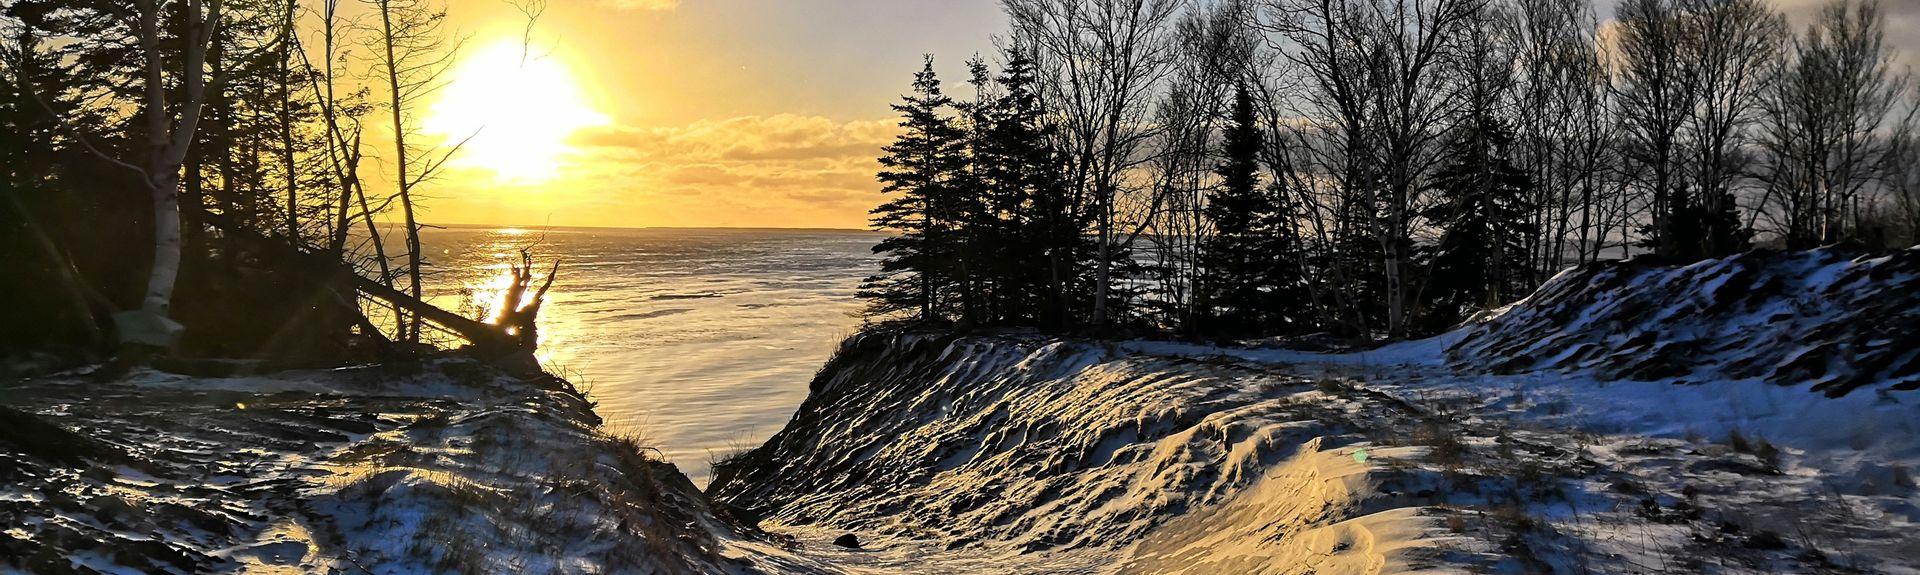 Skir Dhu, Breton Cove, Nova Scotia, Canada